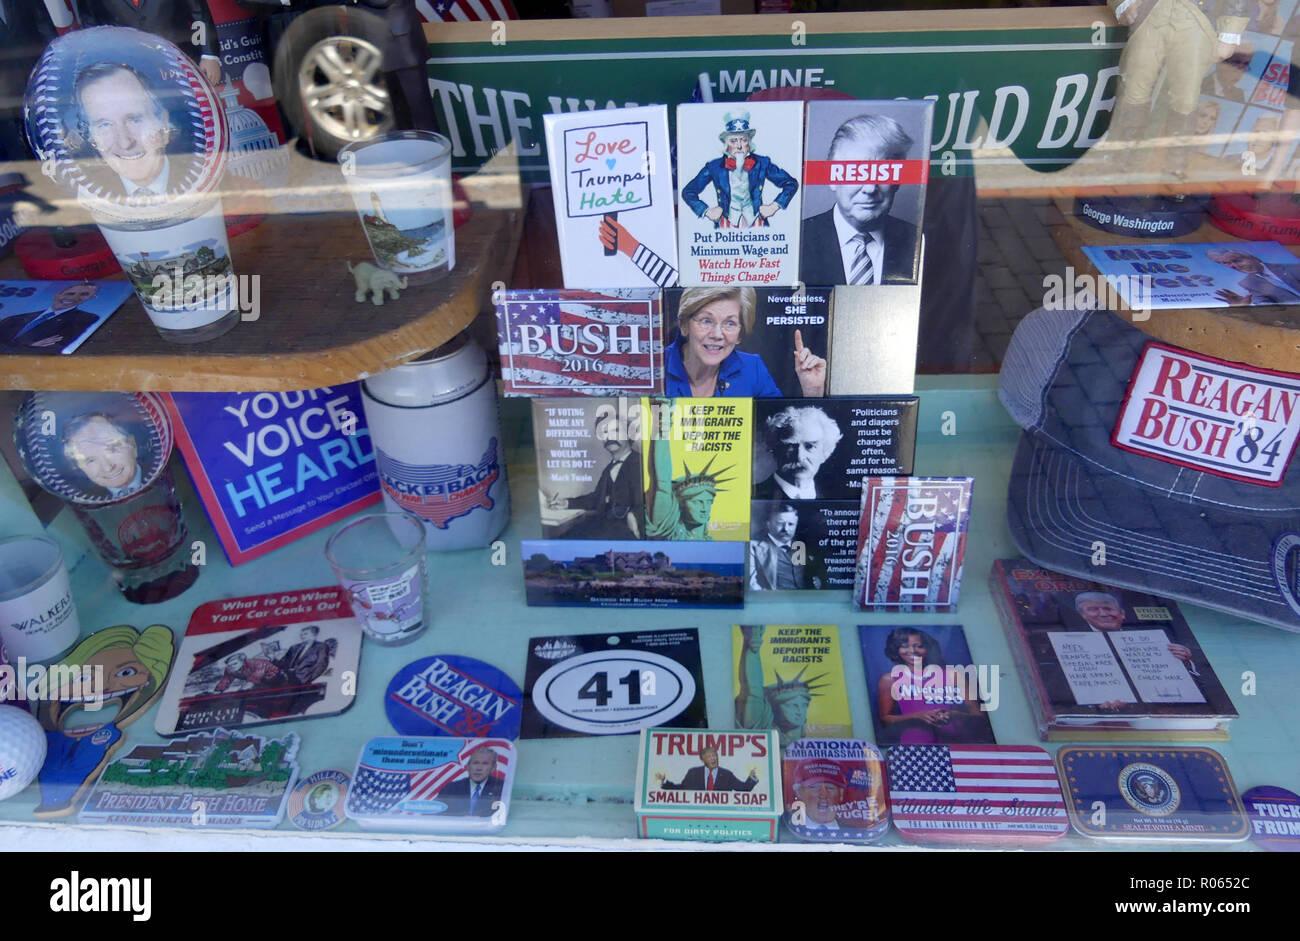 AMERICAN POLITICAL MEMORABILIA in a Washington shop window. Photo: Tony Gale - Stock Image